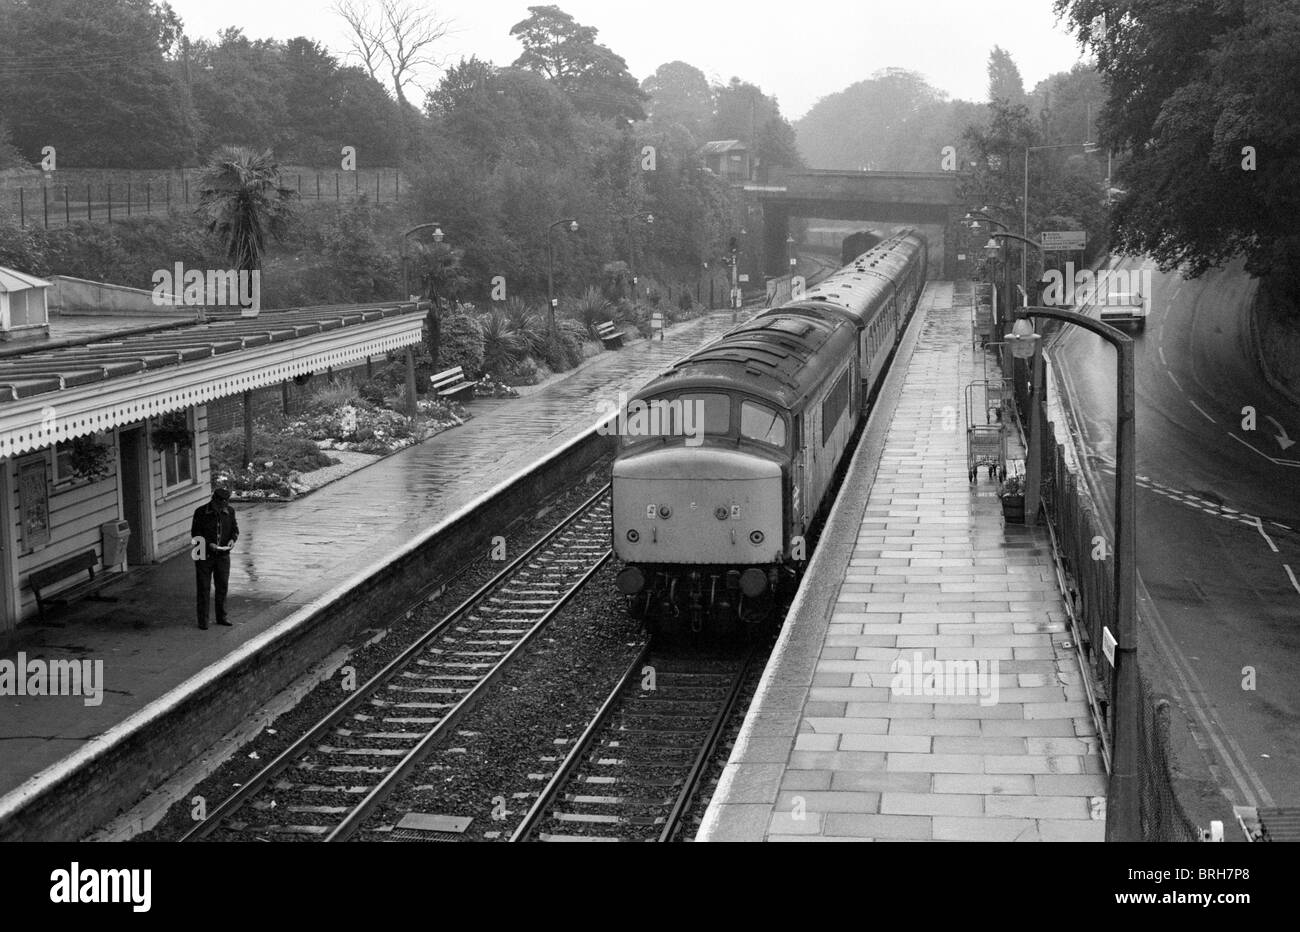 Passenger train at St. Austell railway station, Cornwall, England, UK 1985 - Stock Image